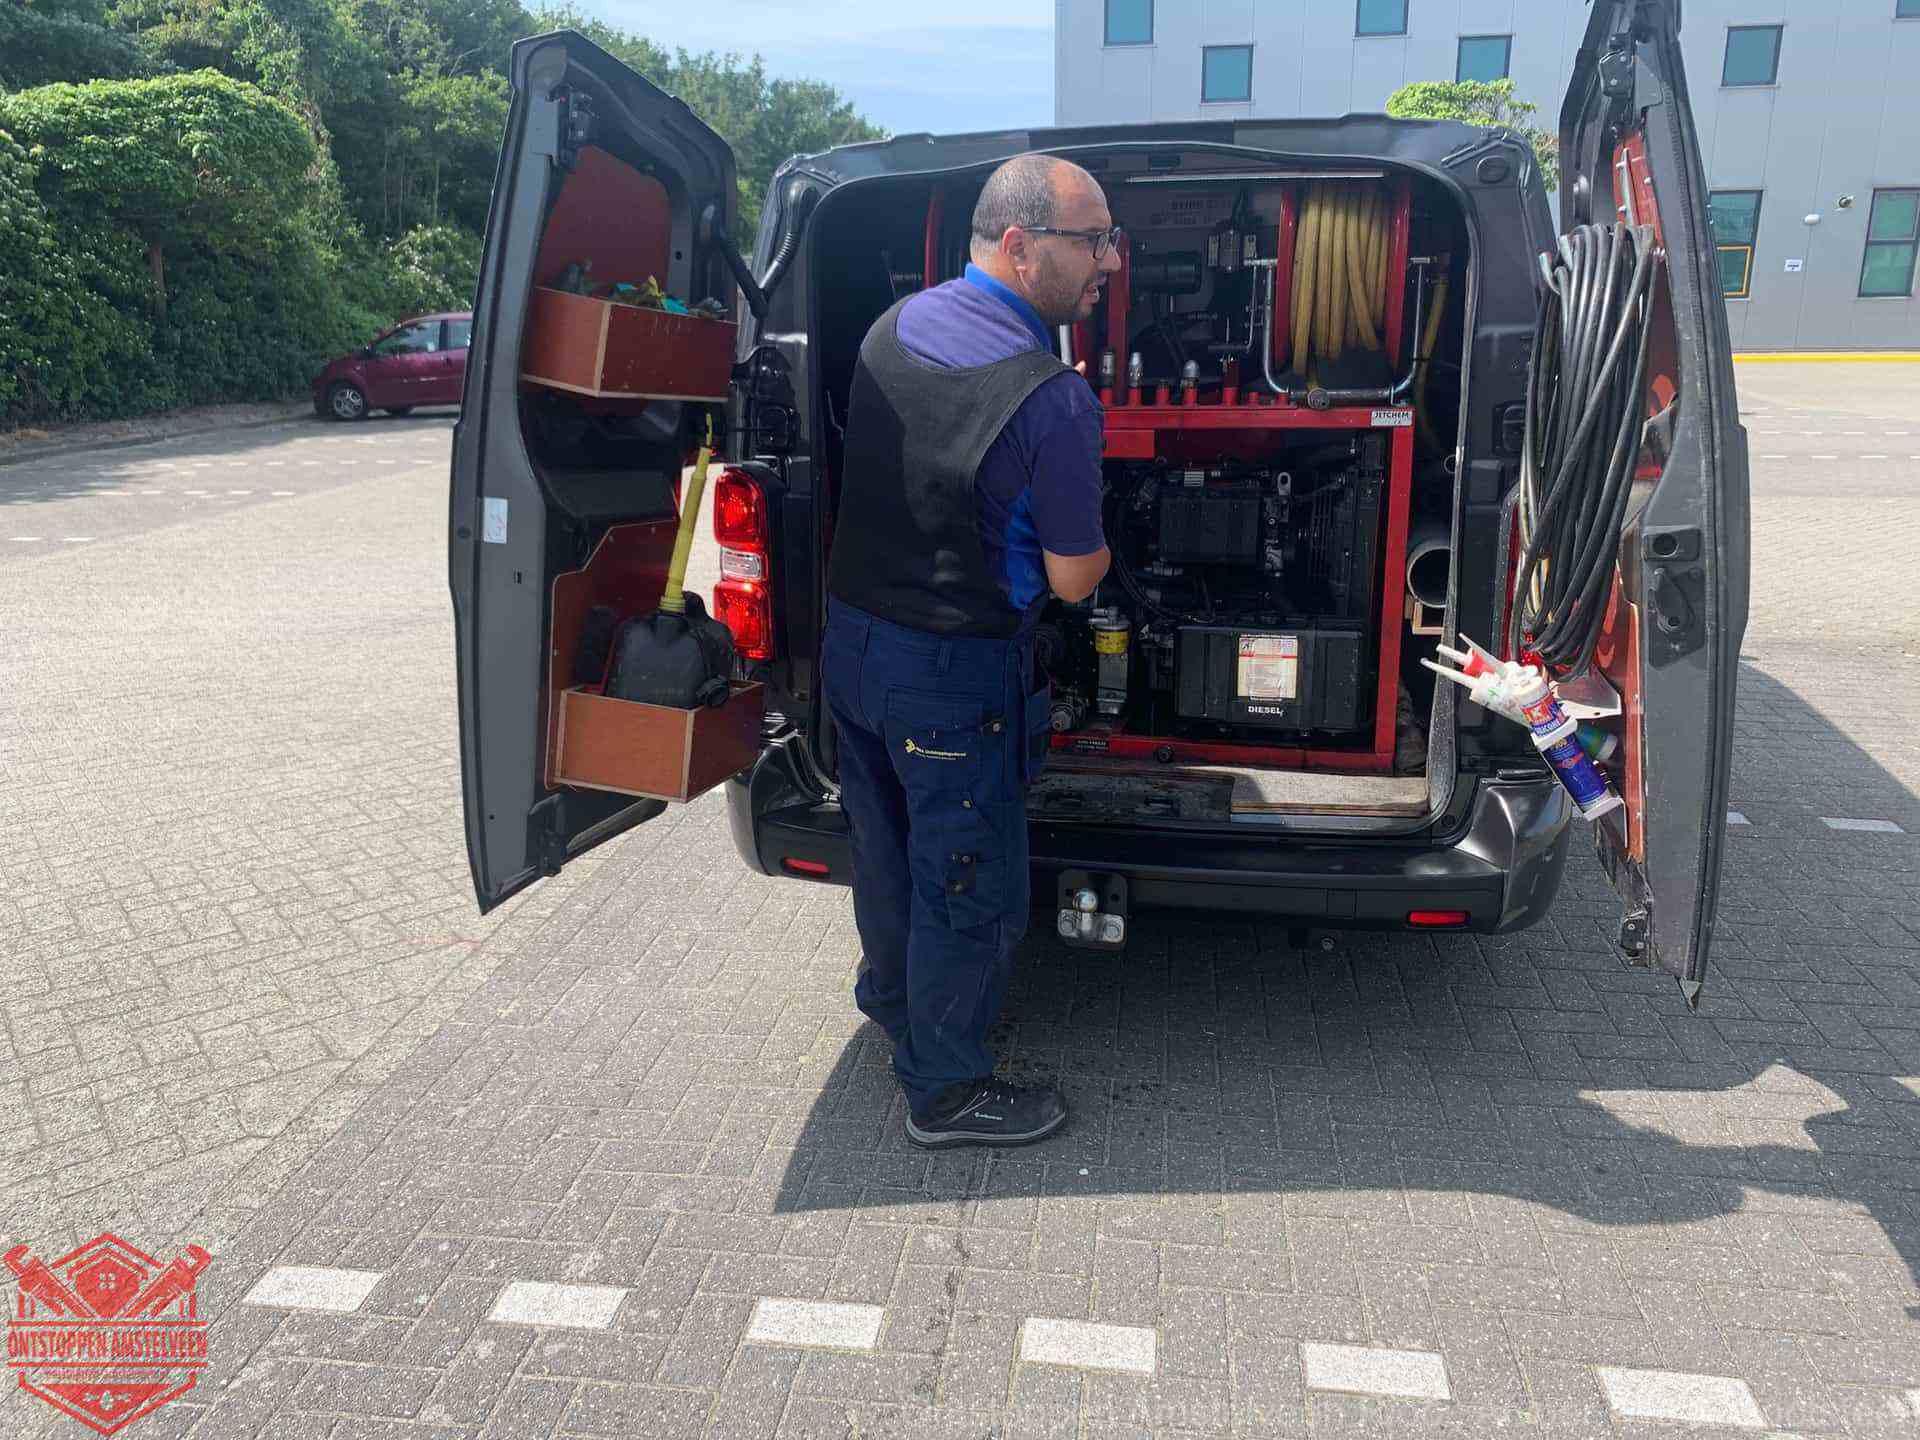 Loodgieter Amstelveen Ontstopping